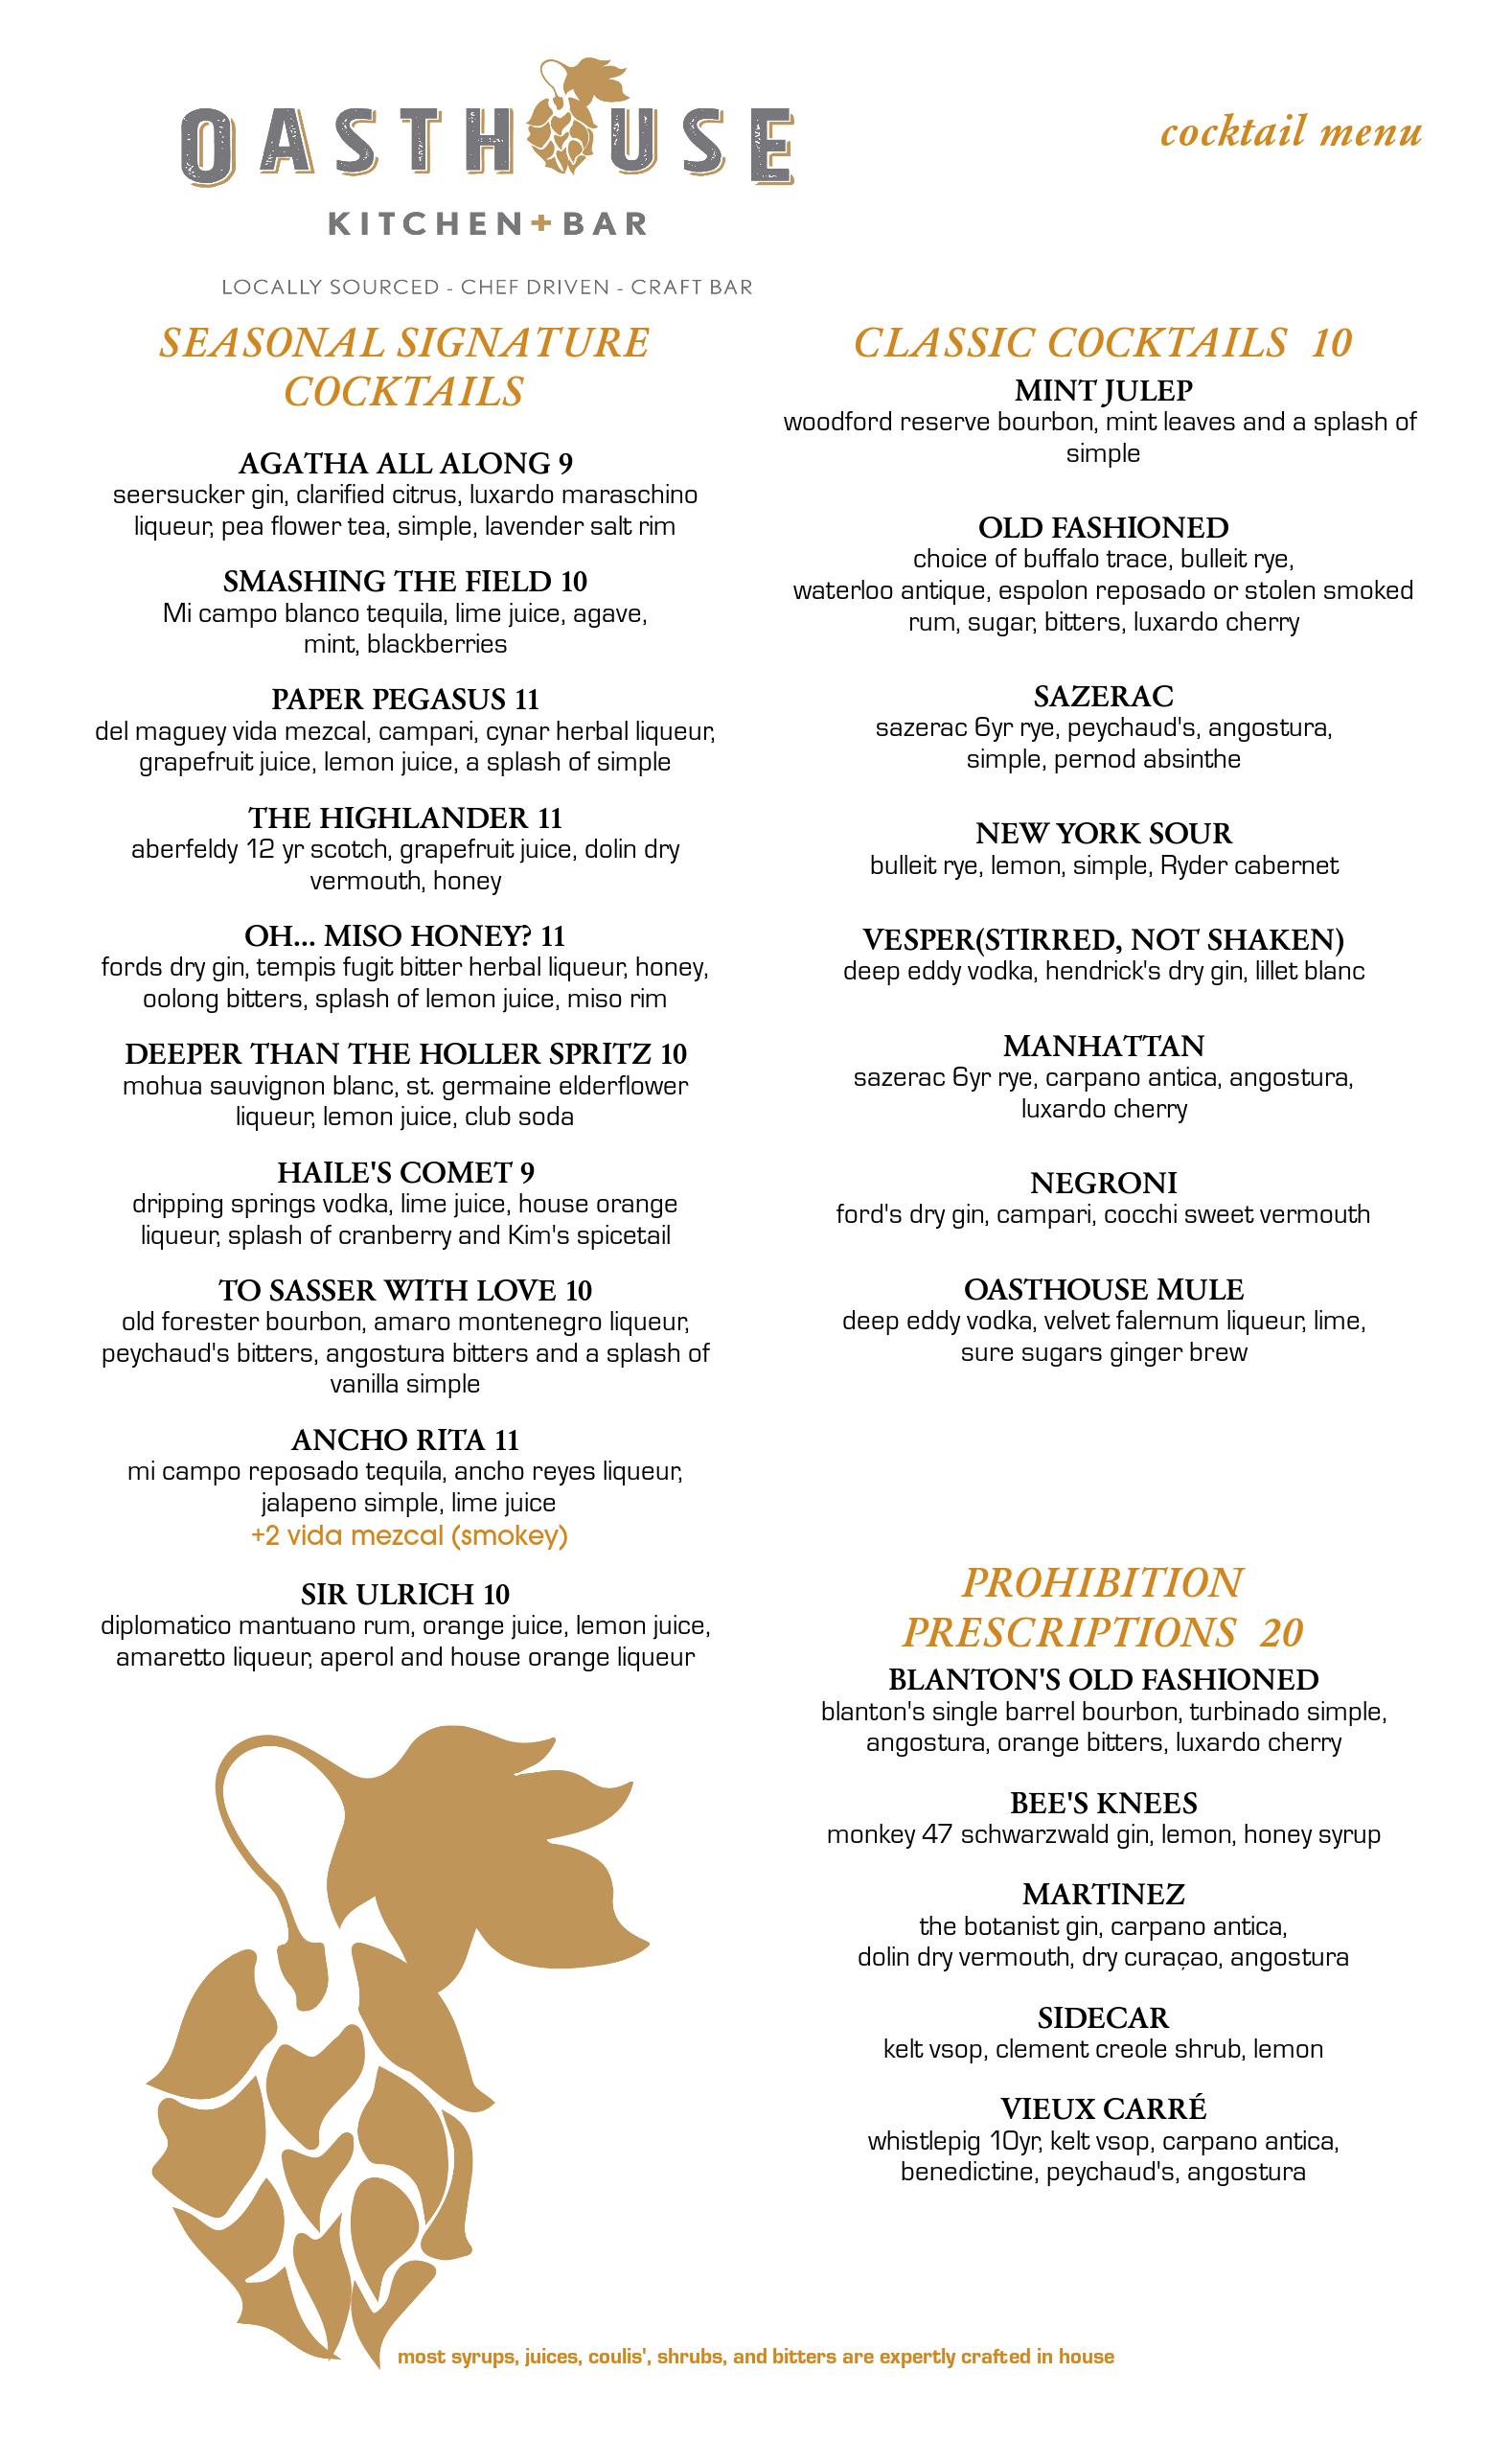 Dine in Cocktail Menu